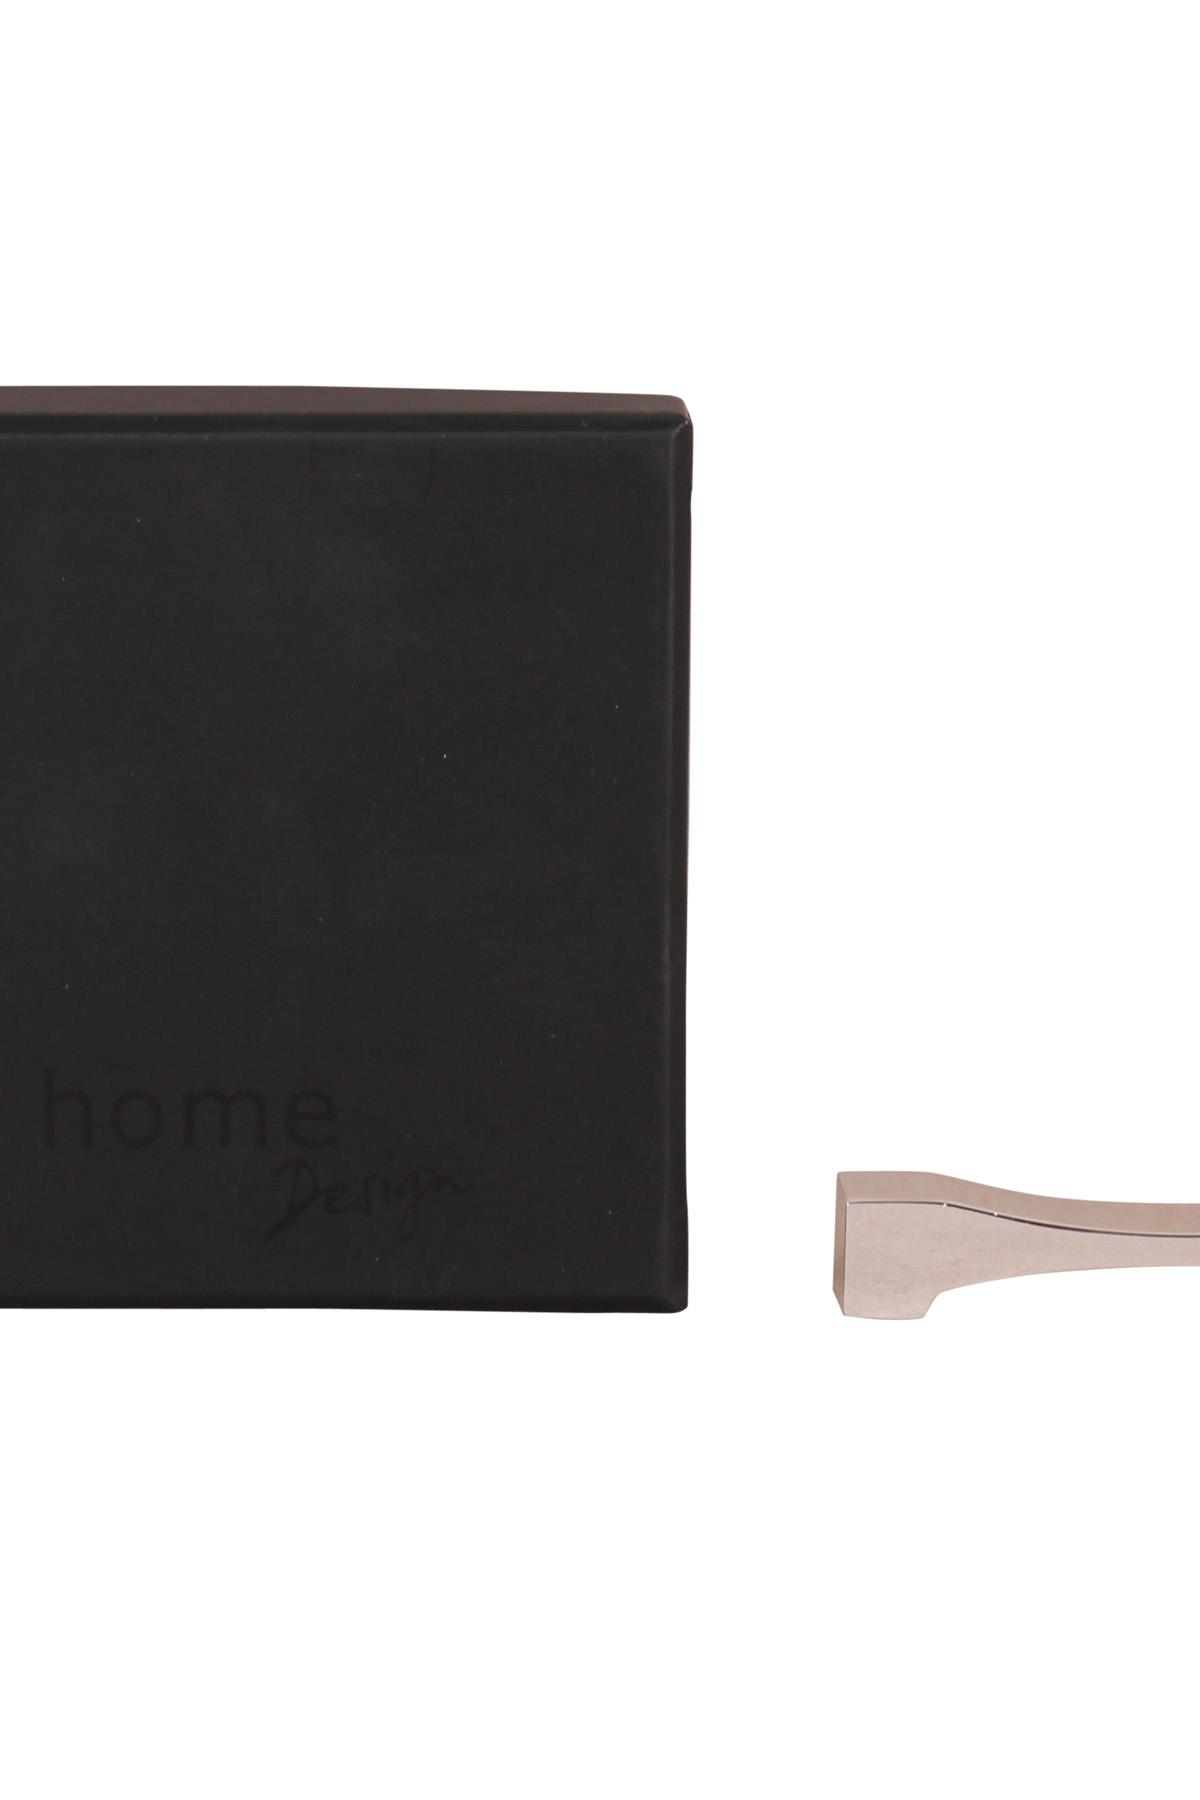 home by wmf messerb nkchen versilbert 2 st ck. Black Bedroom Furniture Sets. Home Design Ideas